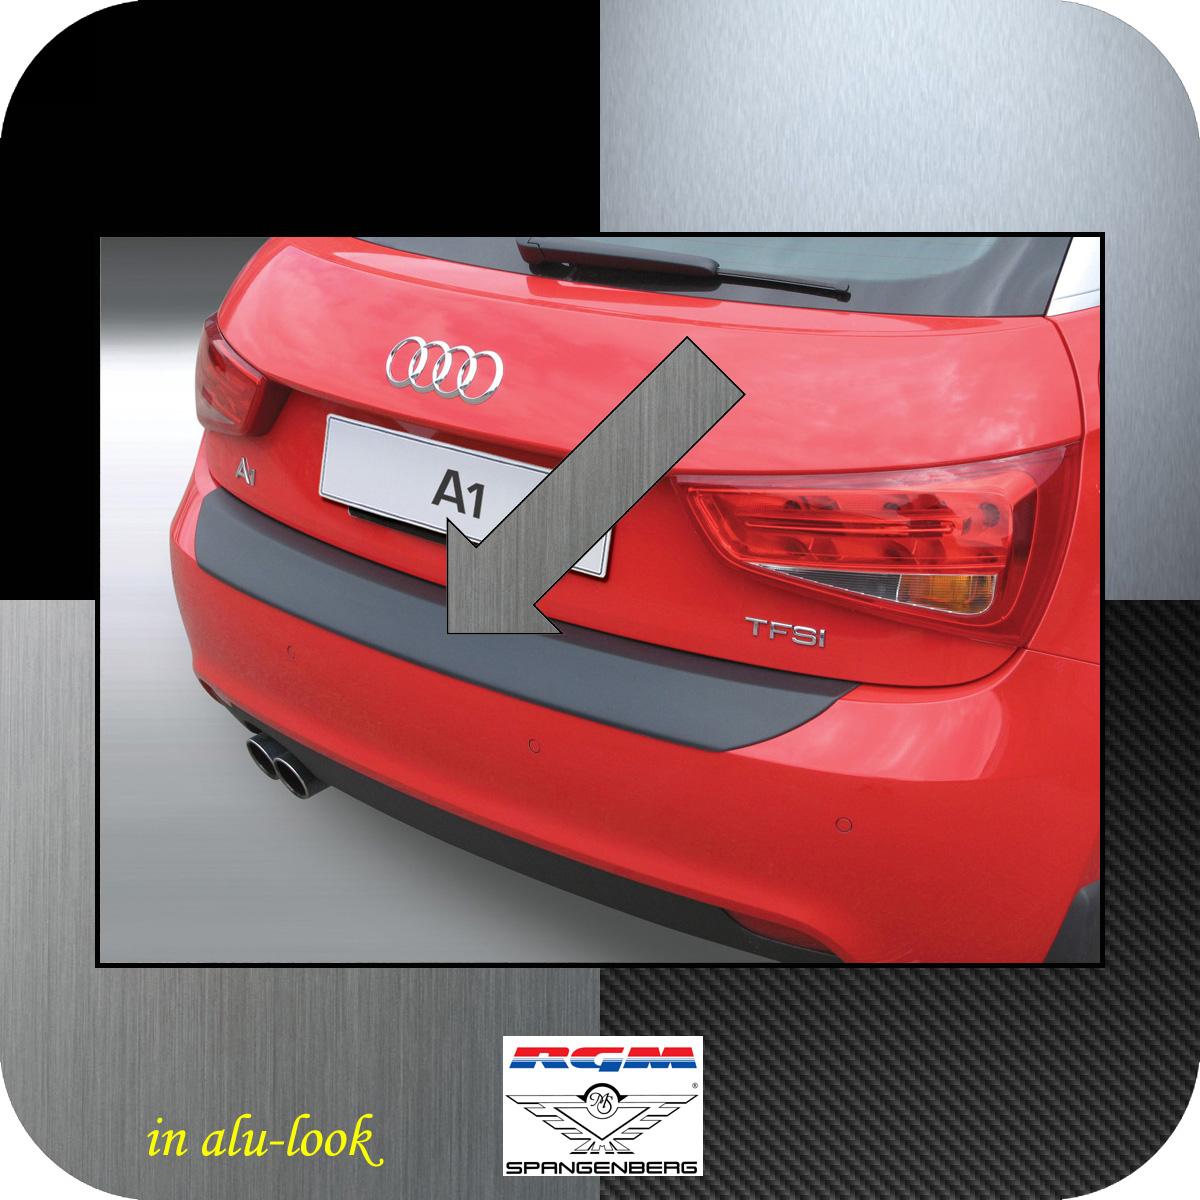 Ladekantenschutz Alu-Look Audi A1 auch Sportback vor facelift 2010-14 3504513